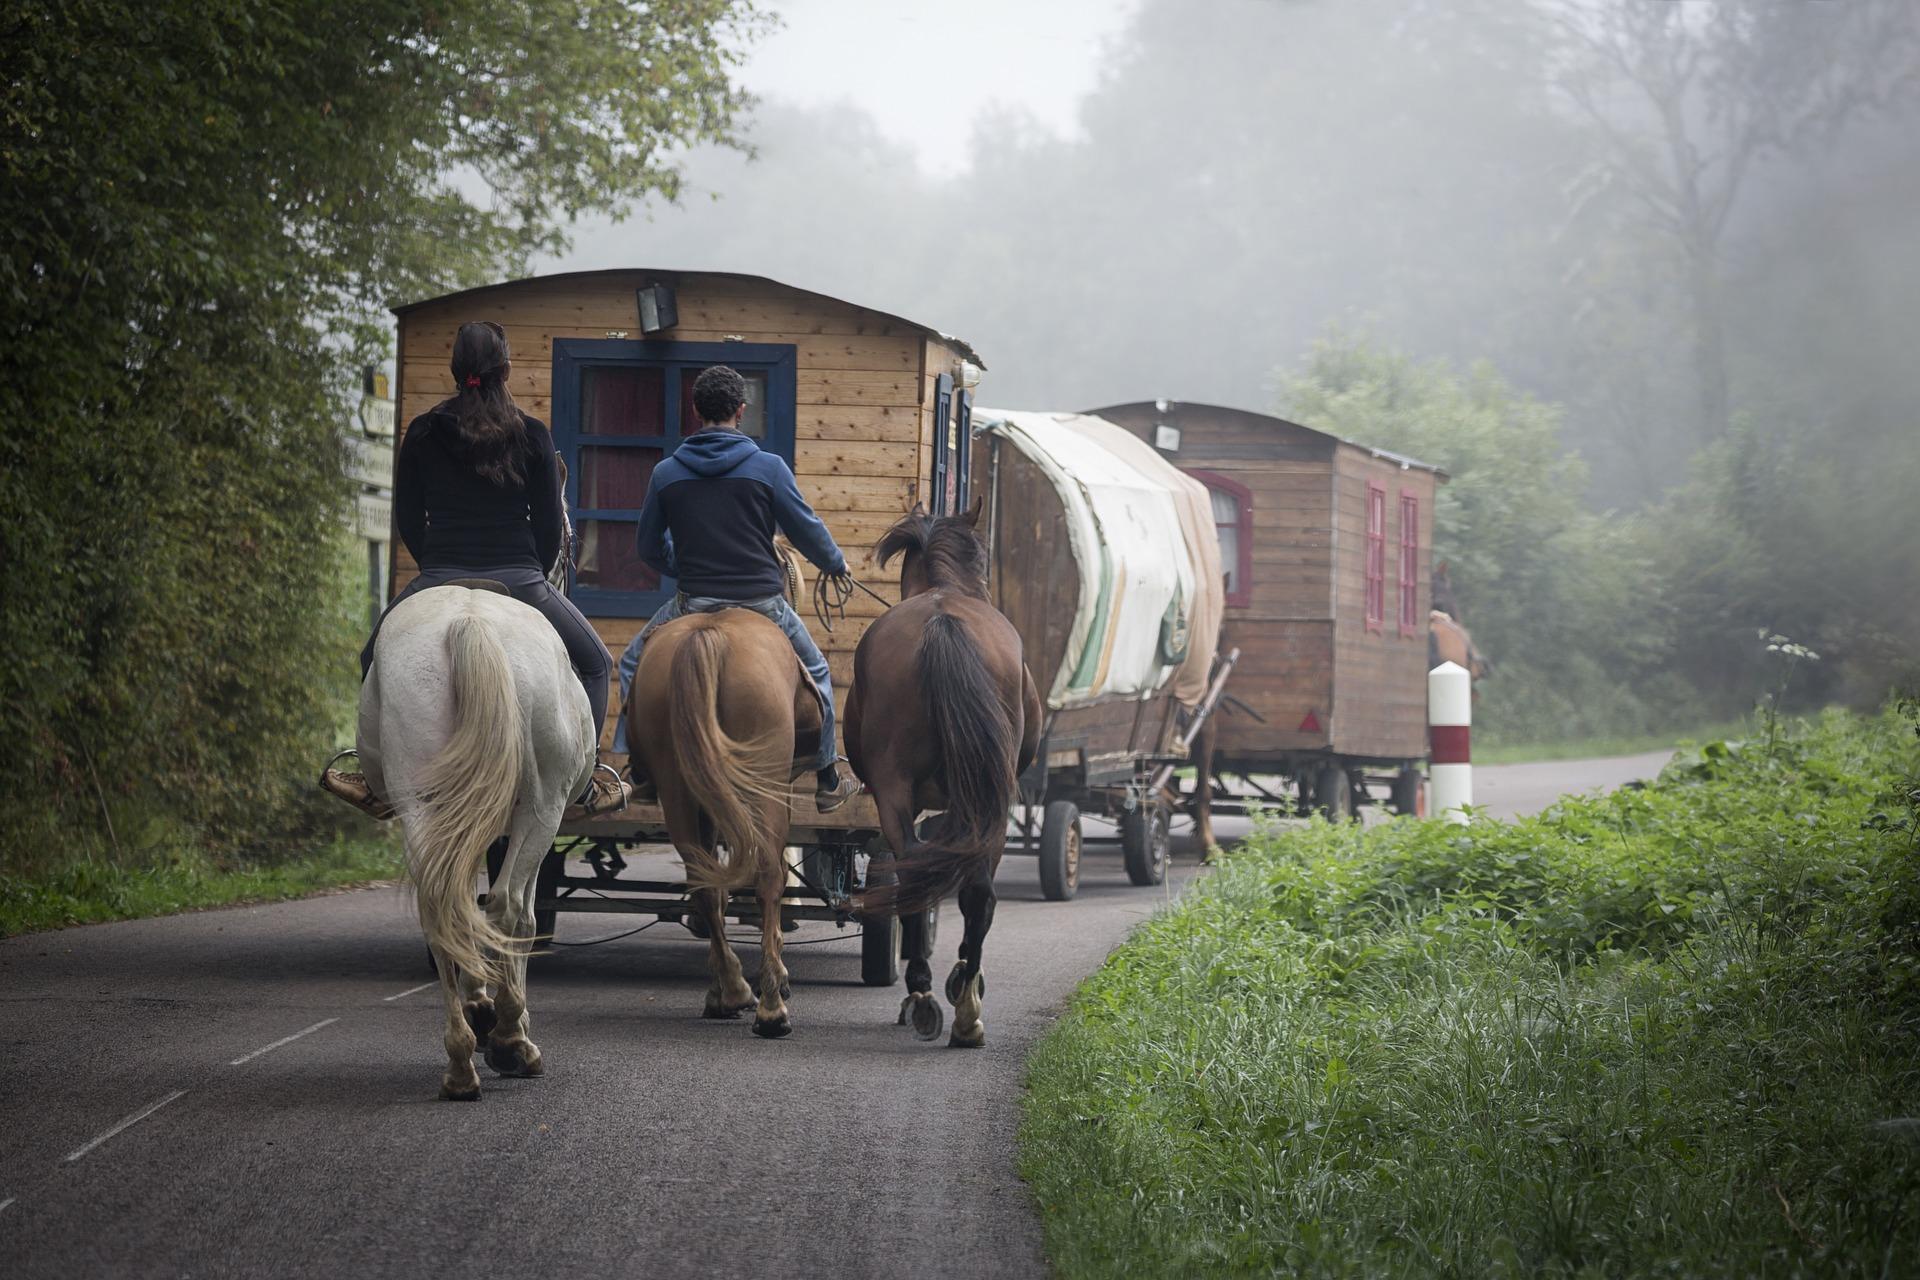 gitans caravane